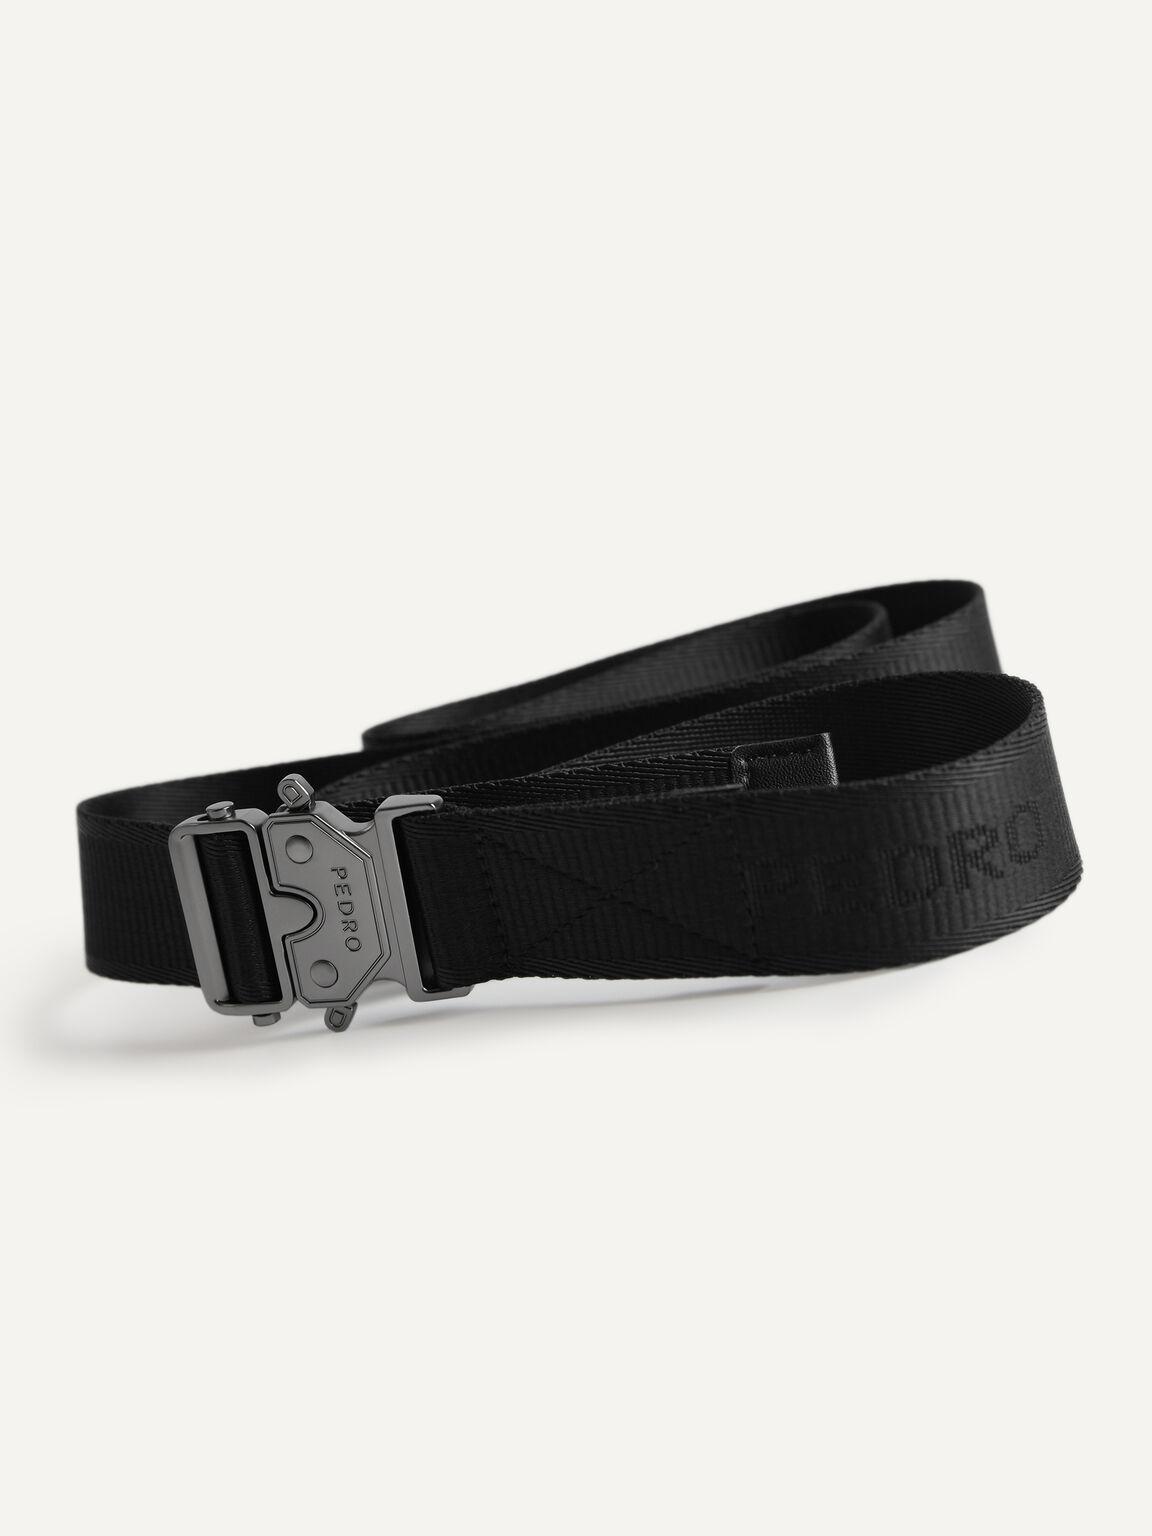 Nylon Buckle Belt, Black, hi-res